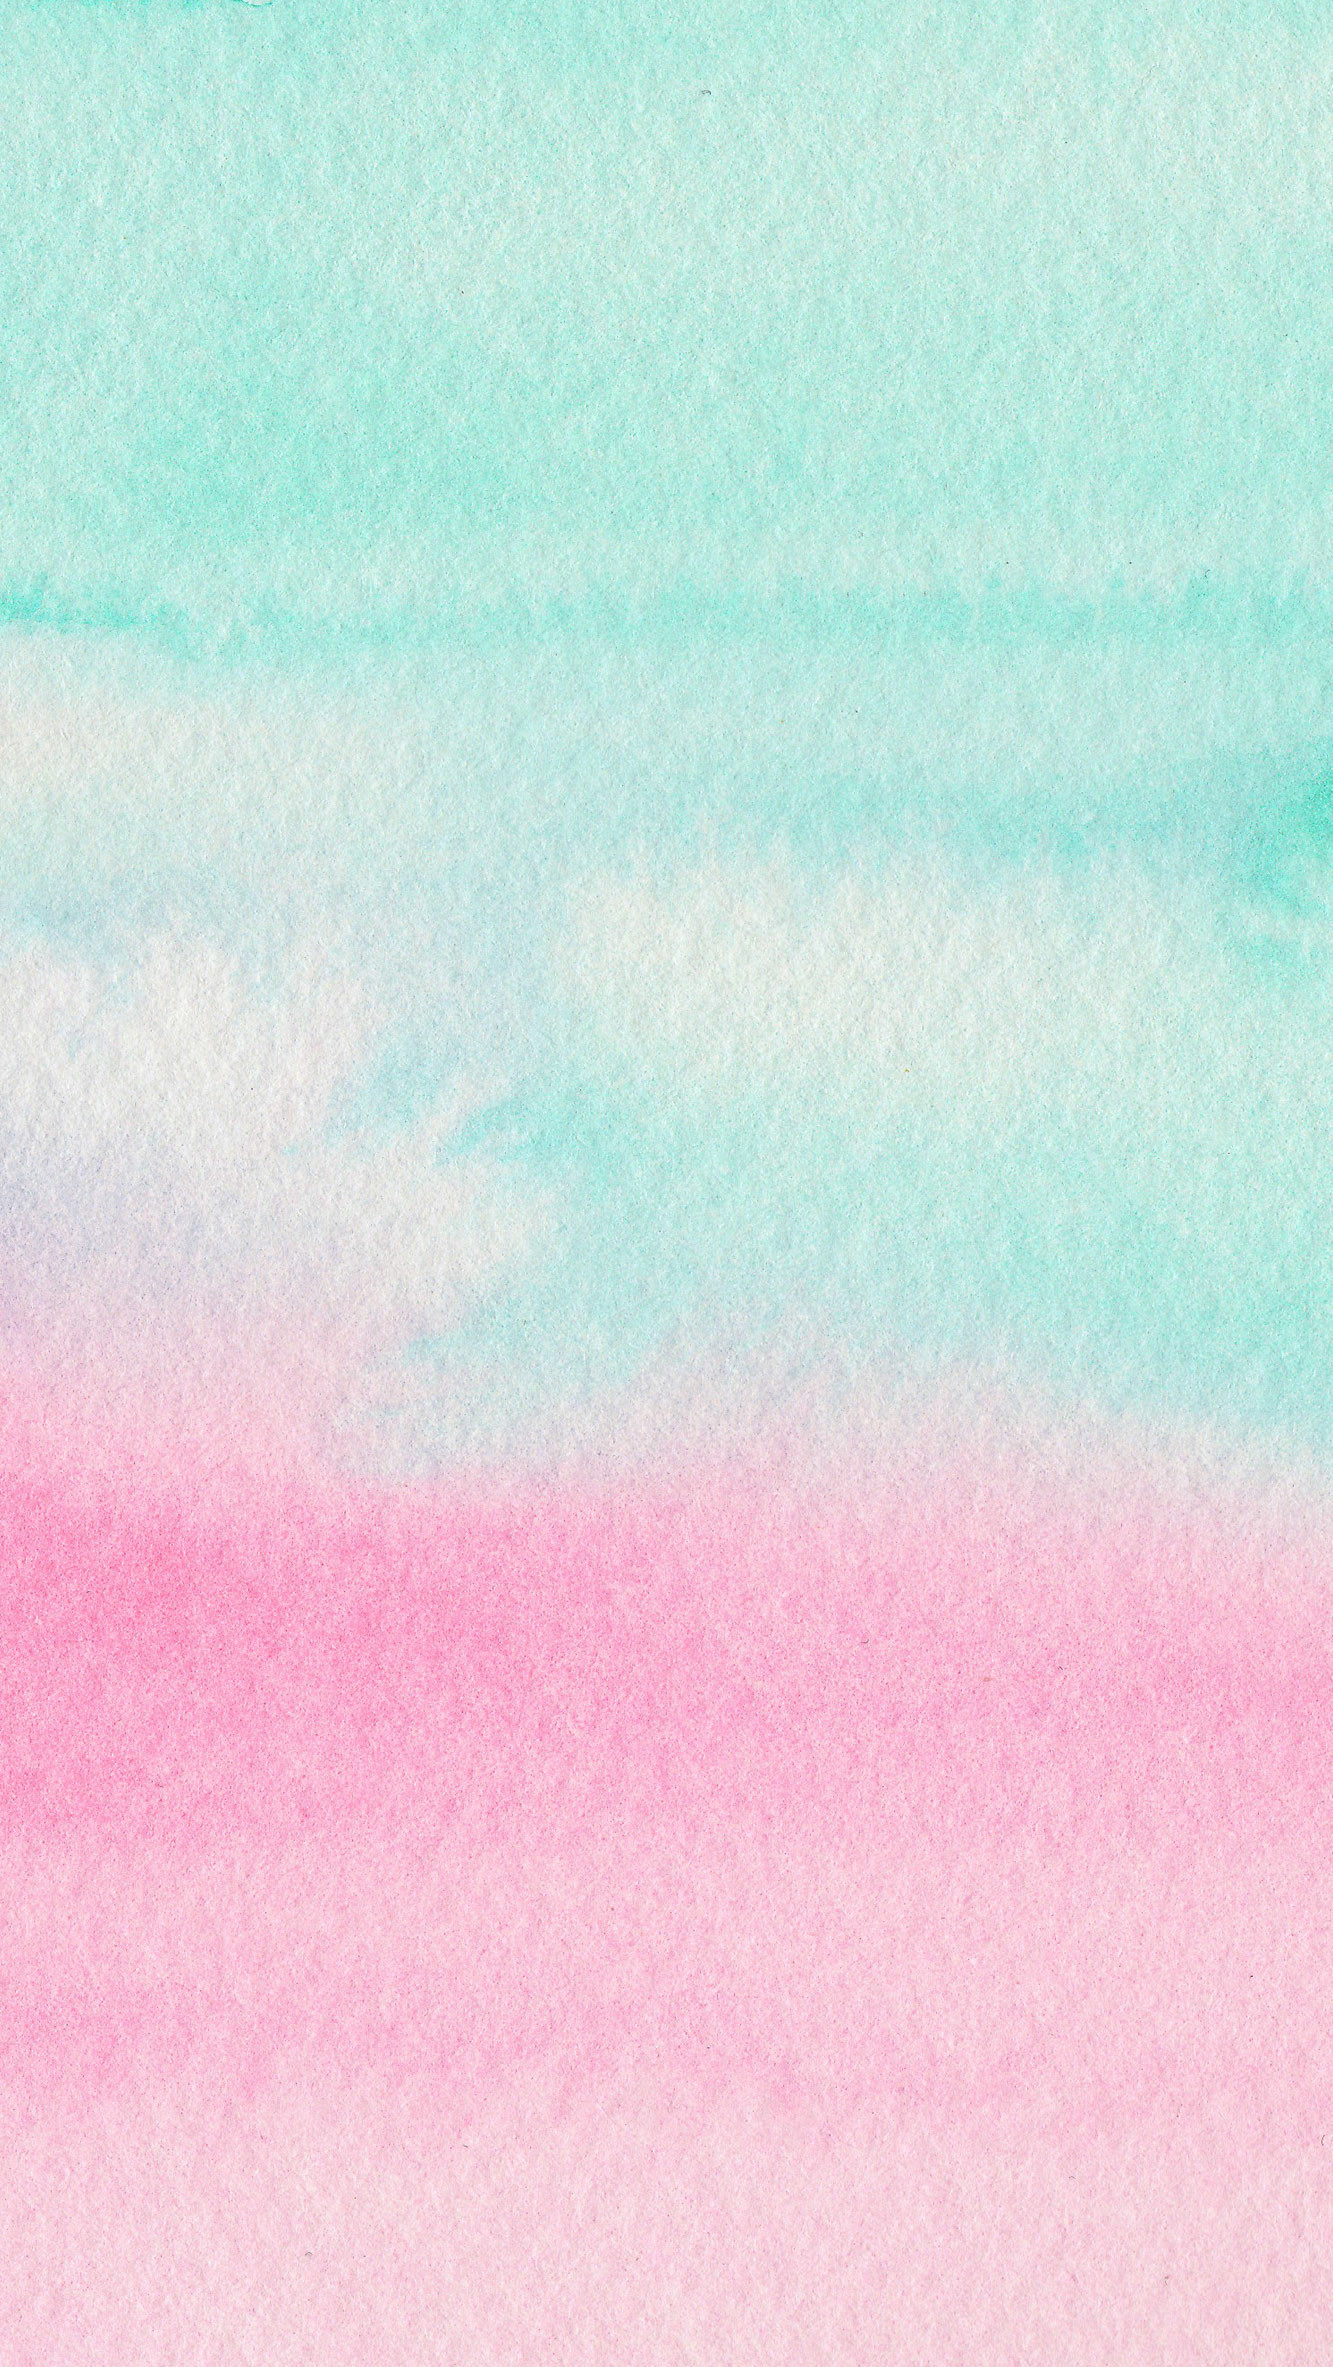 1333x2367 Mint Aqua Pink Watercolour Ombre Texture Iphone Wallpaper Phone Background Lock